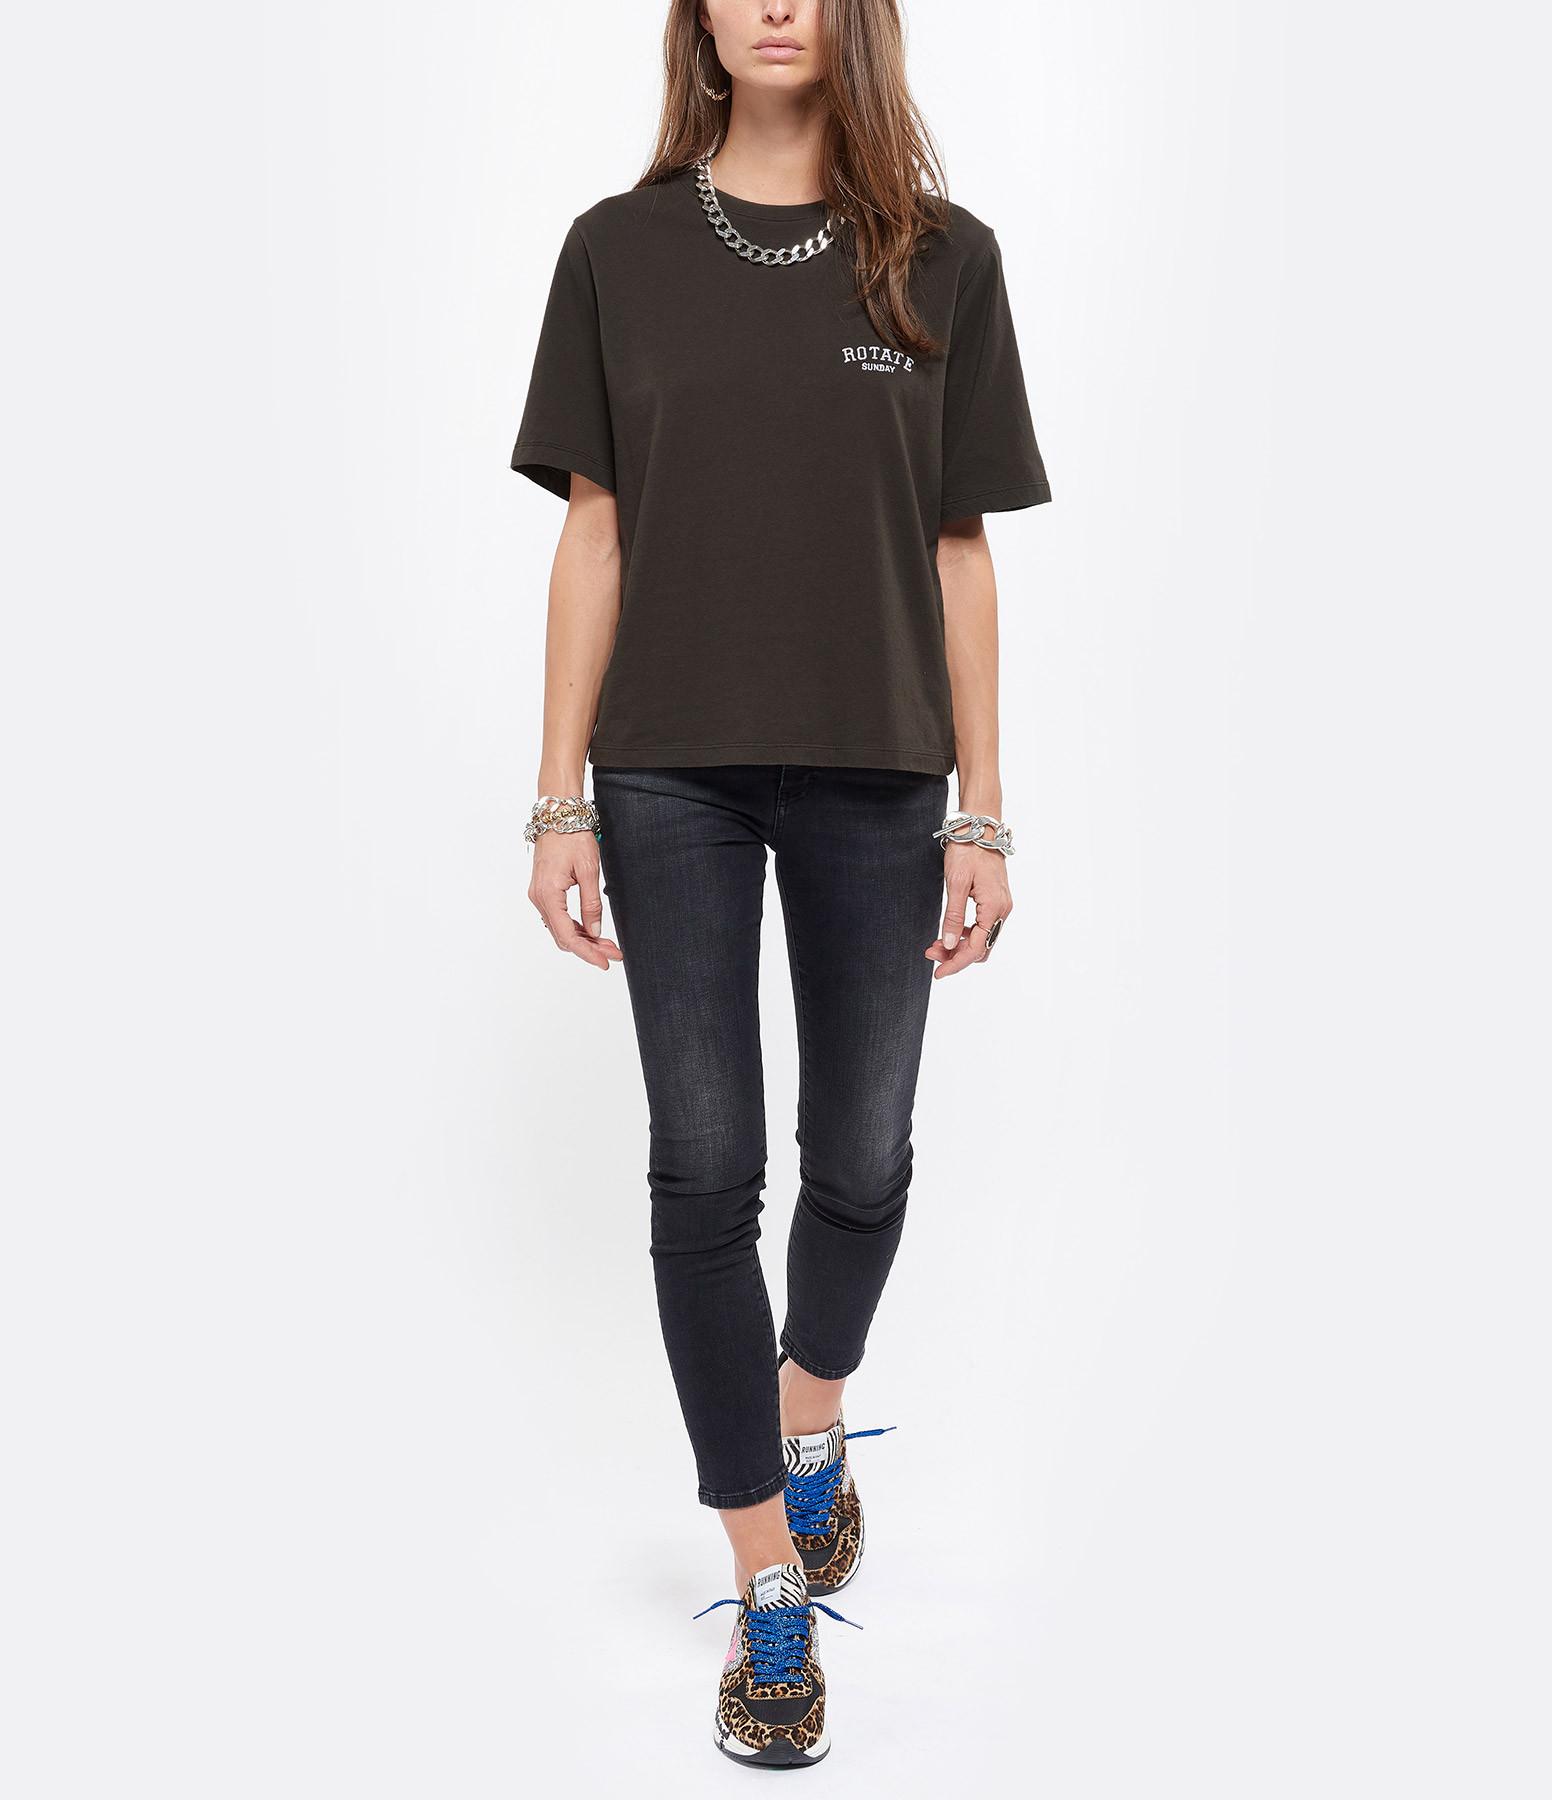 ROTATE - Tee-shirt Aster Coton Biologique Noir, Capsule Sun